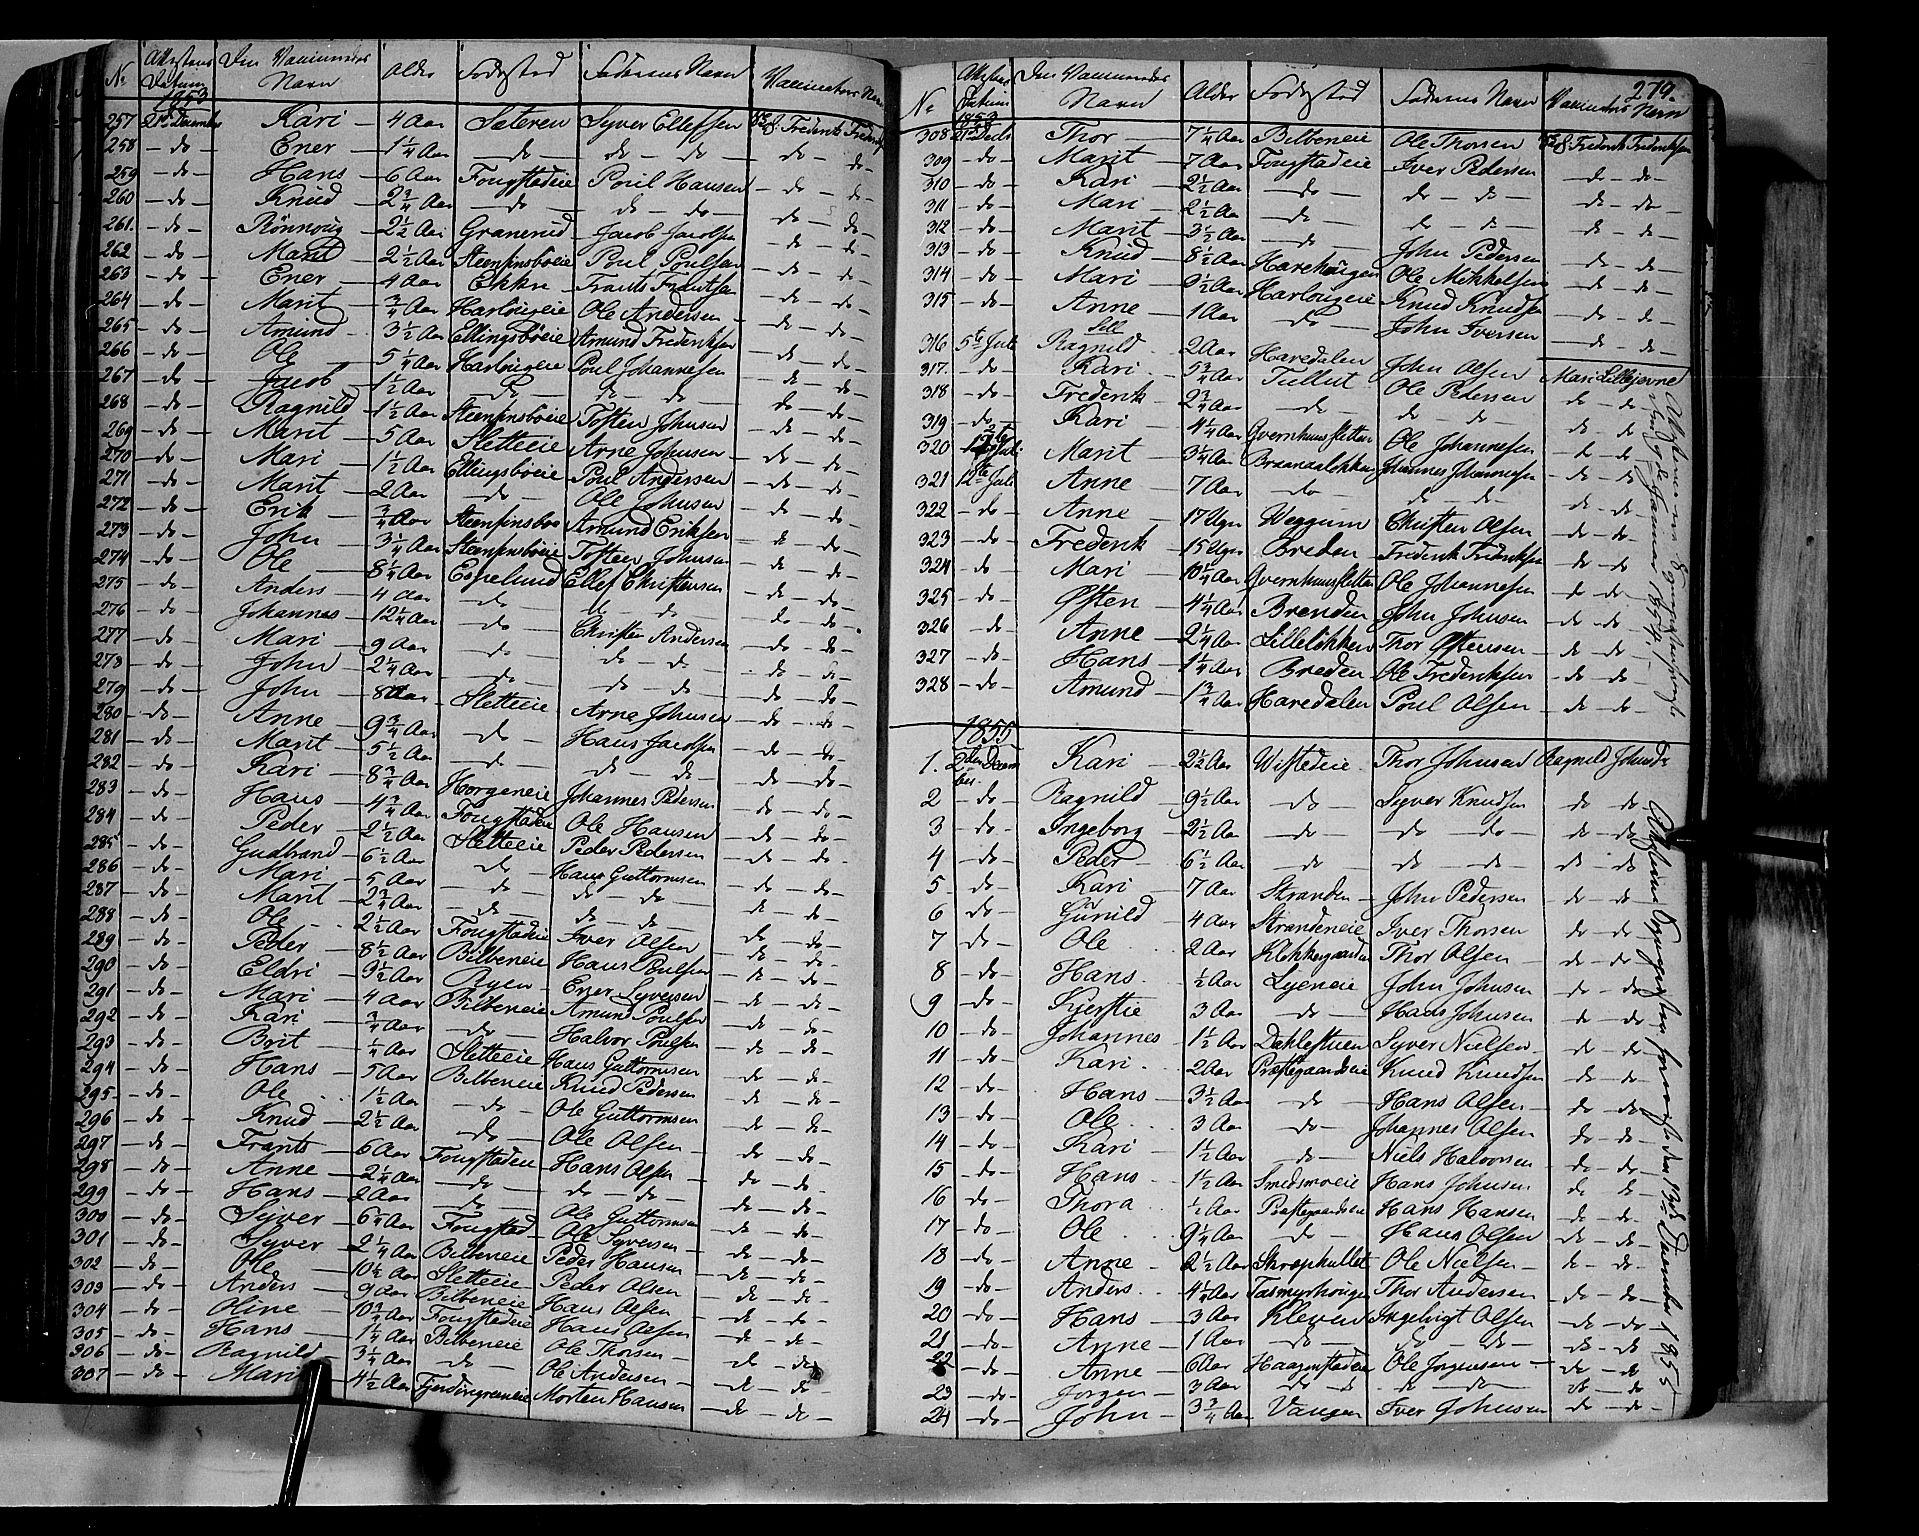 SAH, Vågå prestekontor, Ministerialbok nr. 5 /1, 1842-1856, s. 279